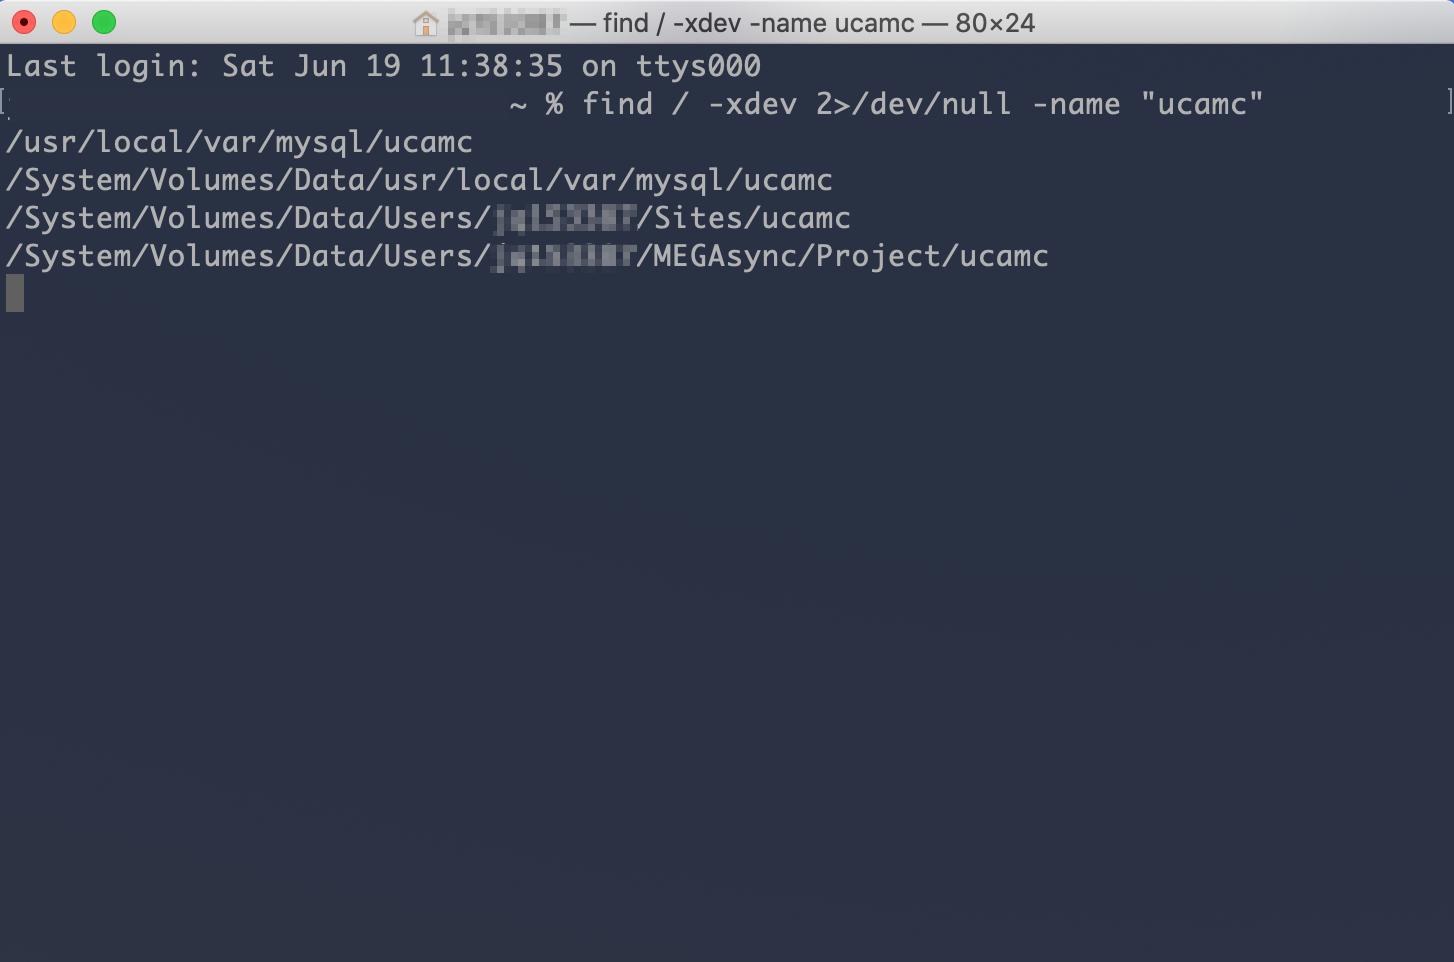 server服務器終端機(Terminal)上找到它的目錄資料夾位置